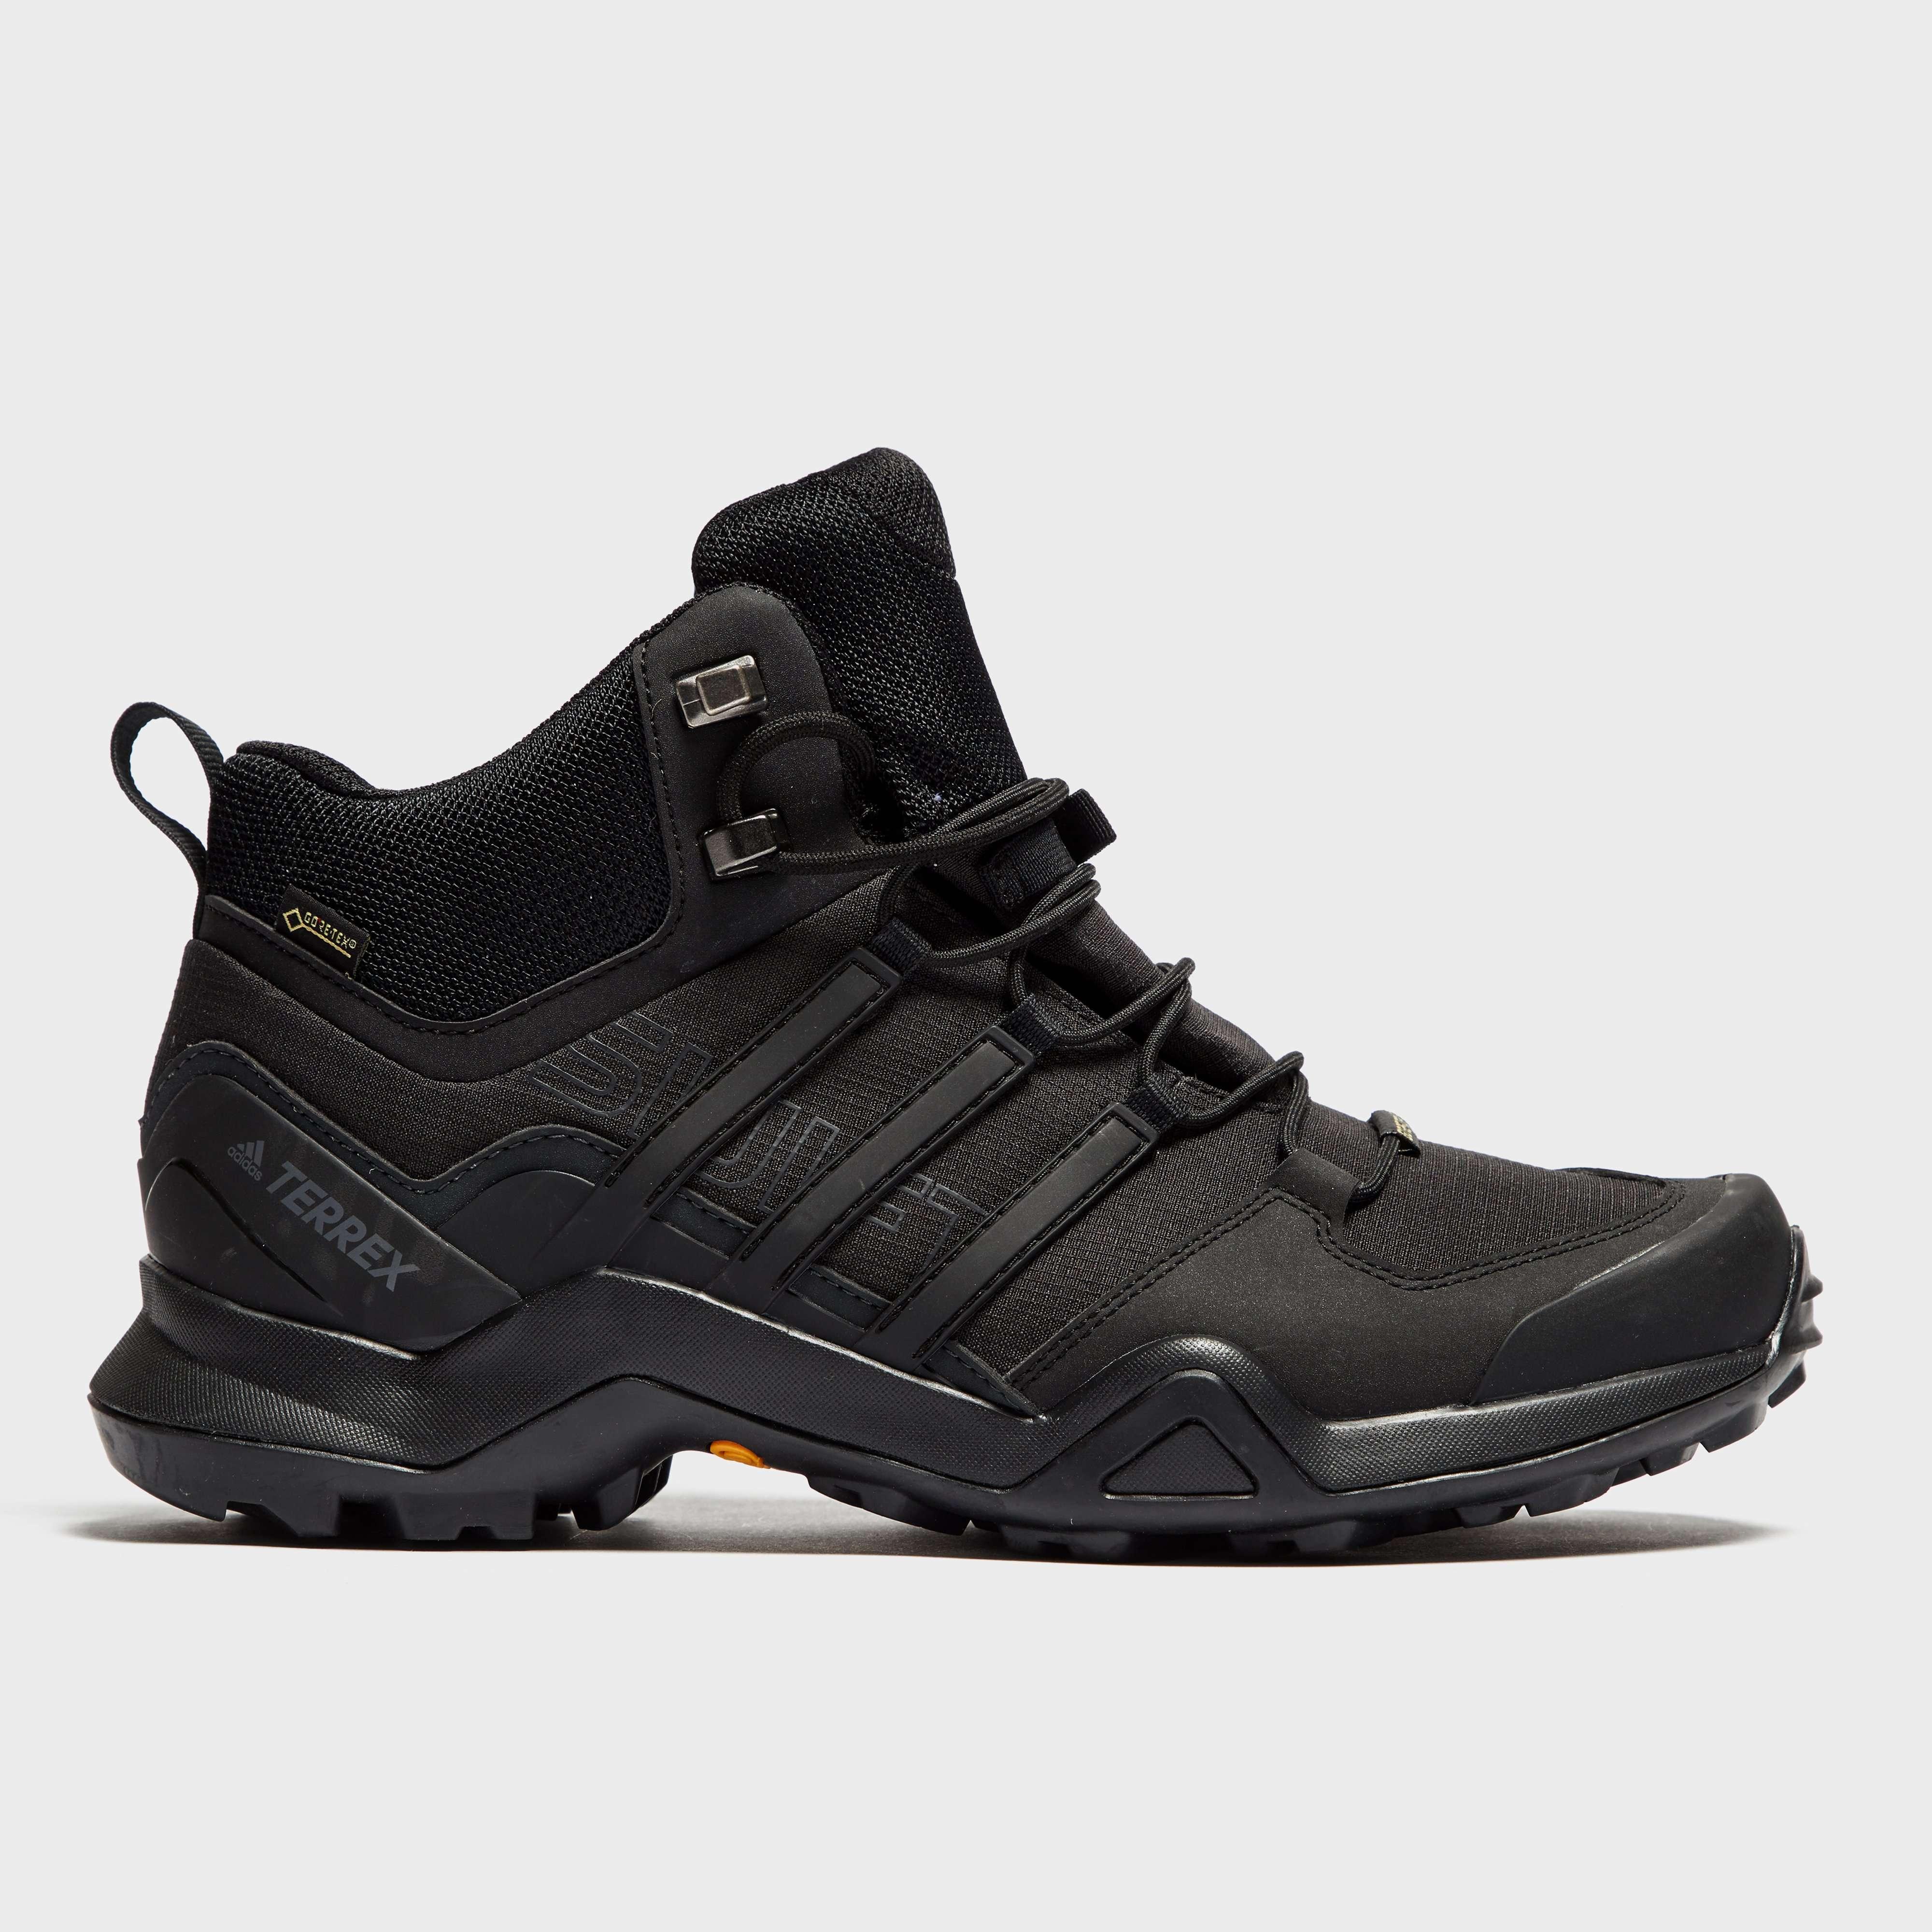 ADIDAS Men's Terrex Swift R2 Mid GORE-TEX® Shoes